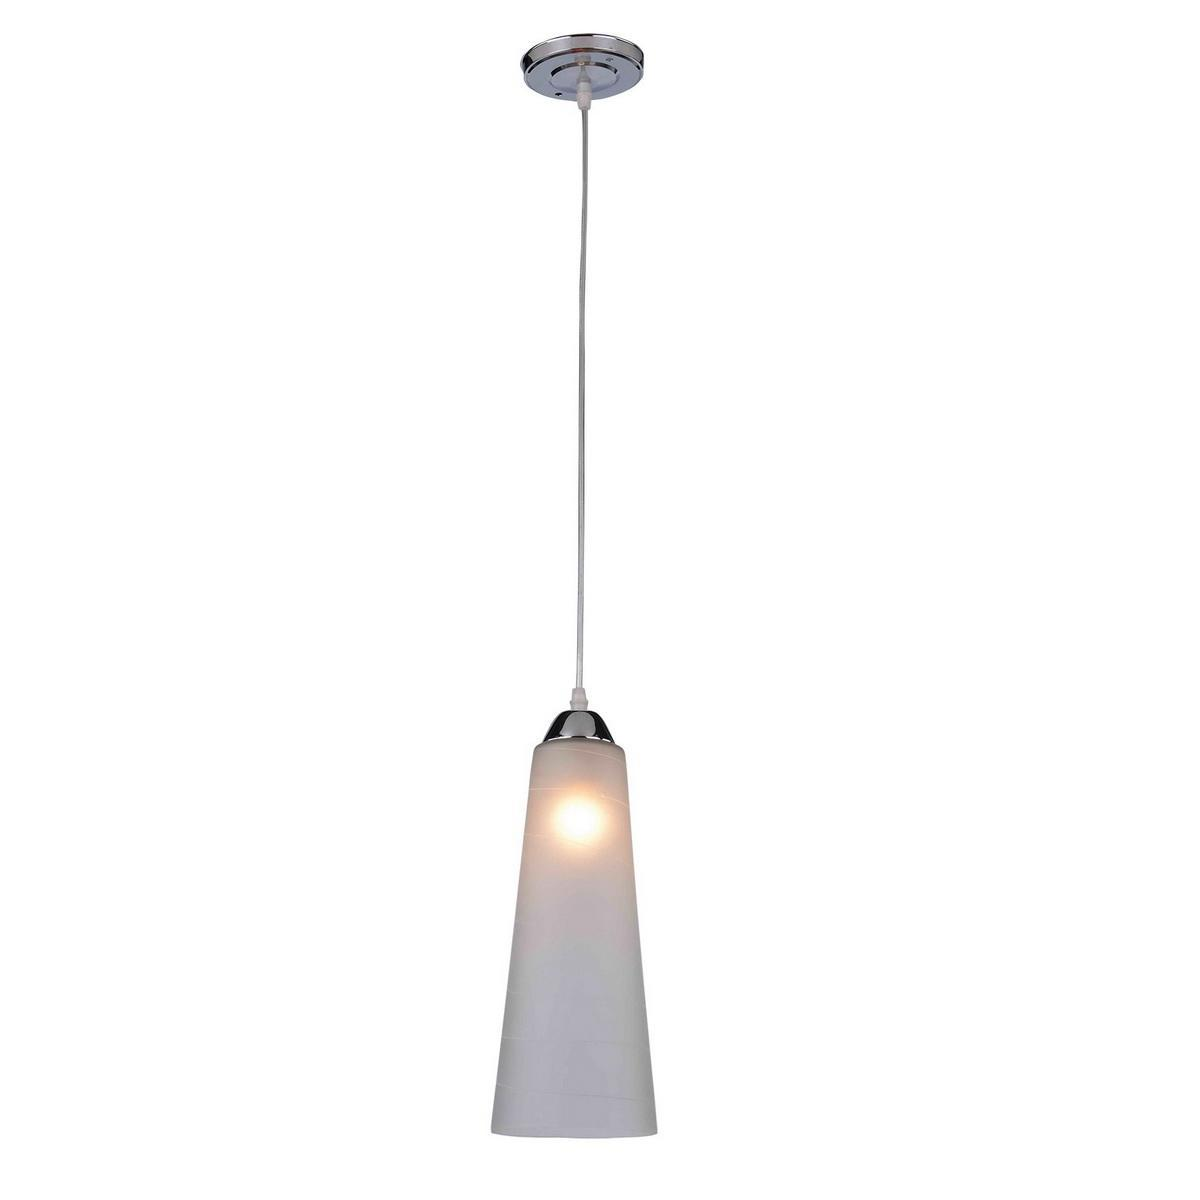 Подвесной светильник IDLamp Iris Glos 236/1-Chrome idlamp 236 3 chrome